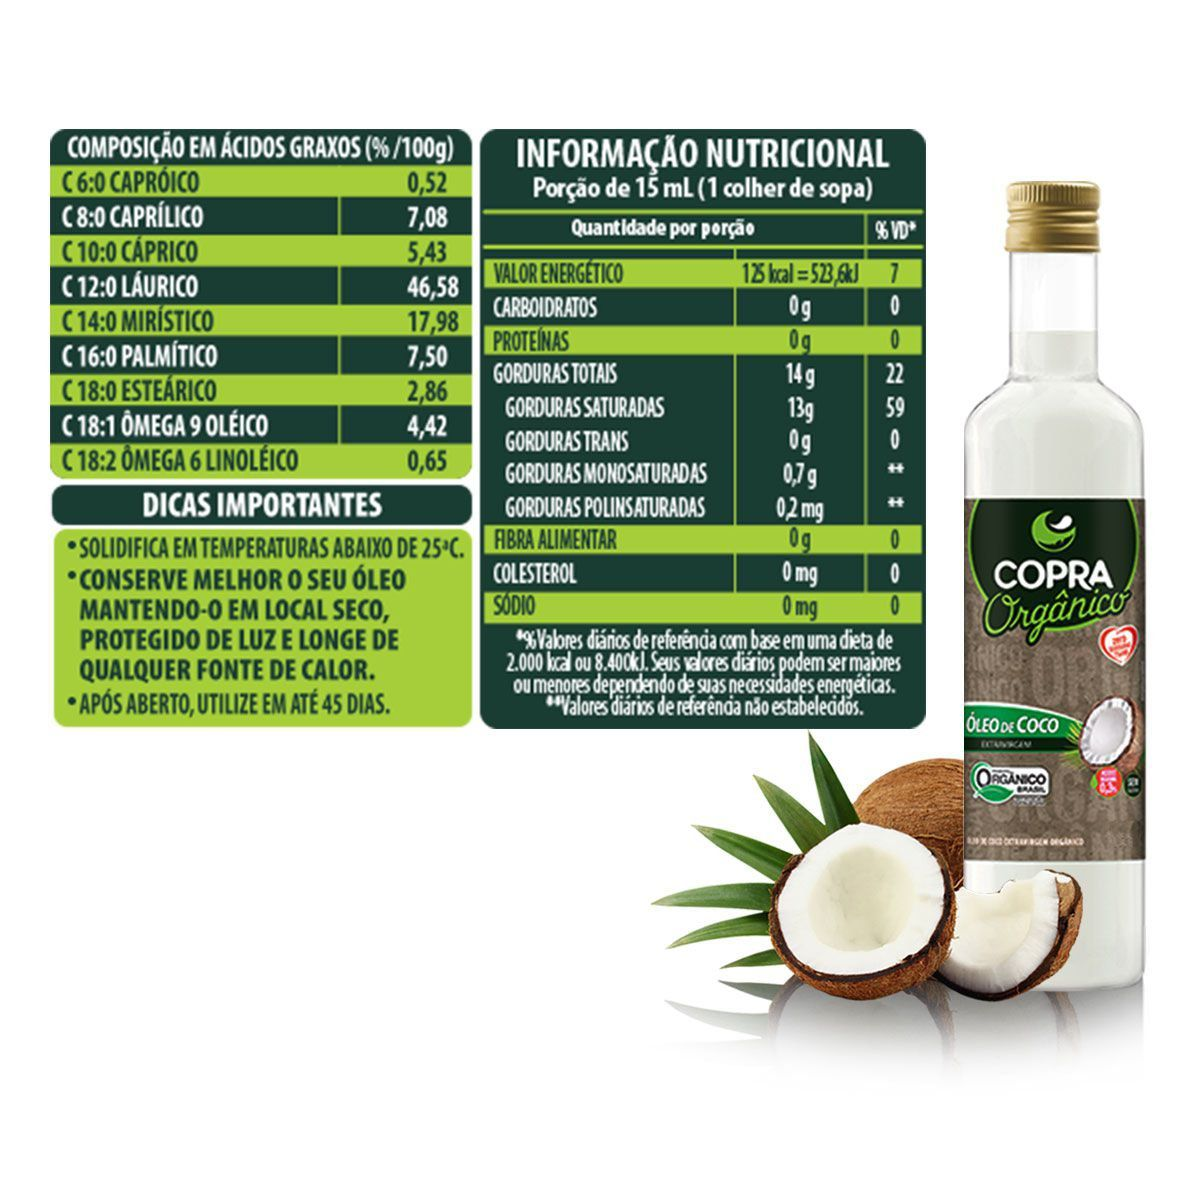 Óleo de Coco Orgânico 500ml Garrafa - Copra